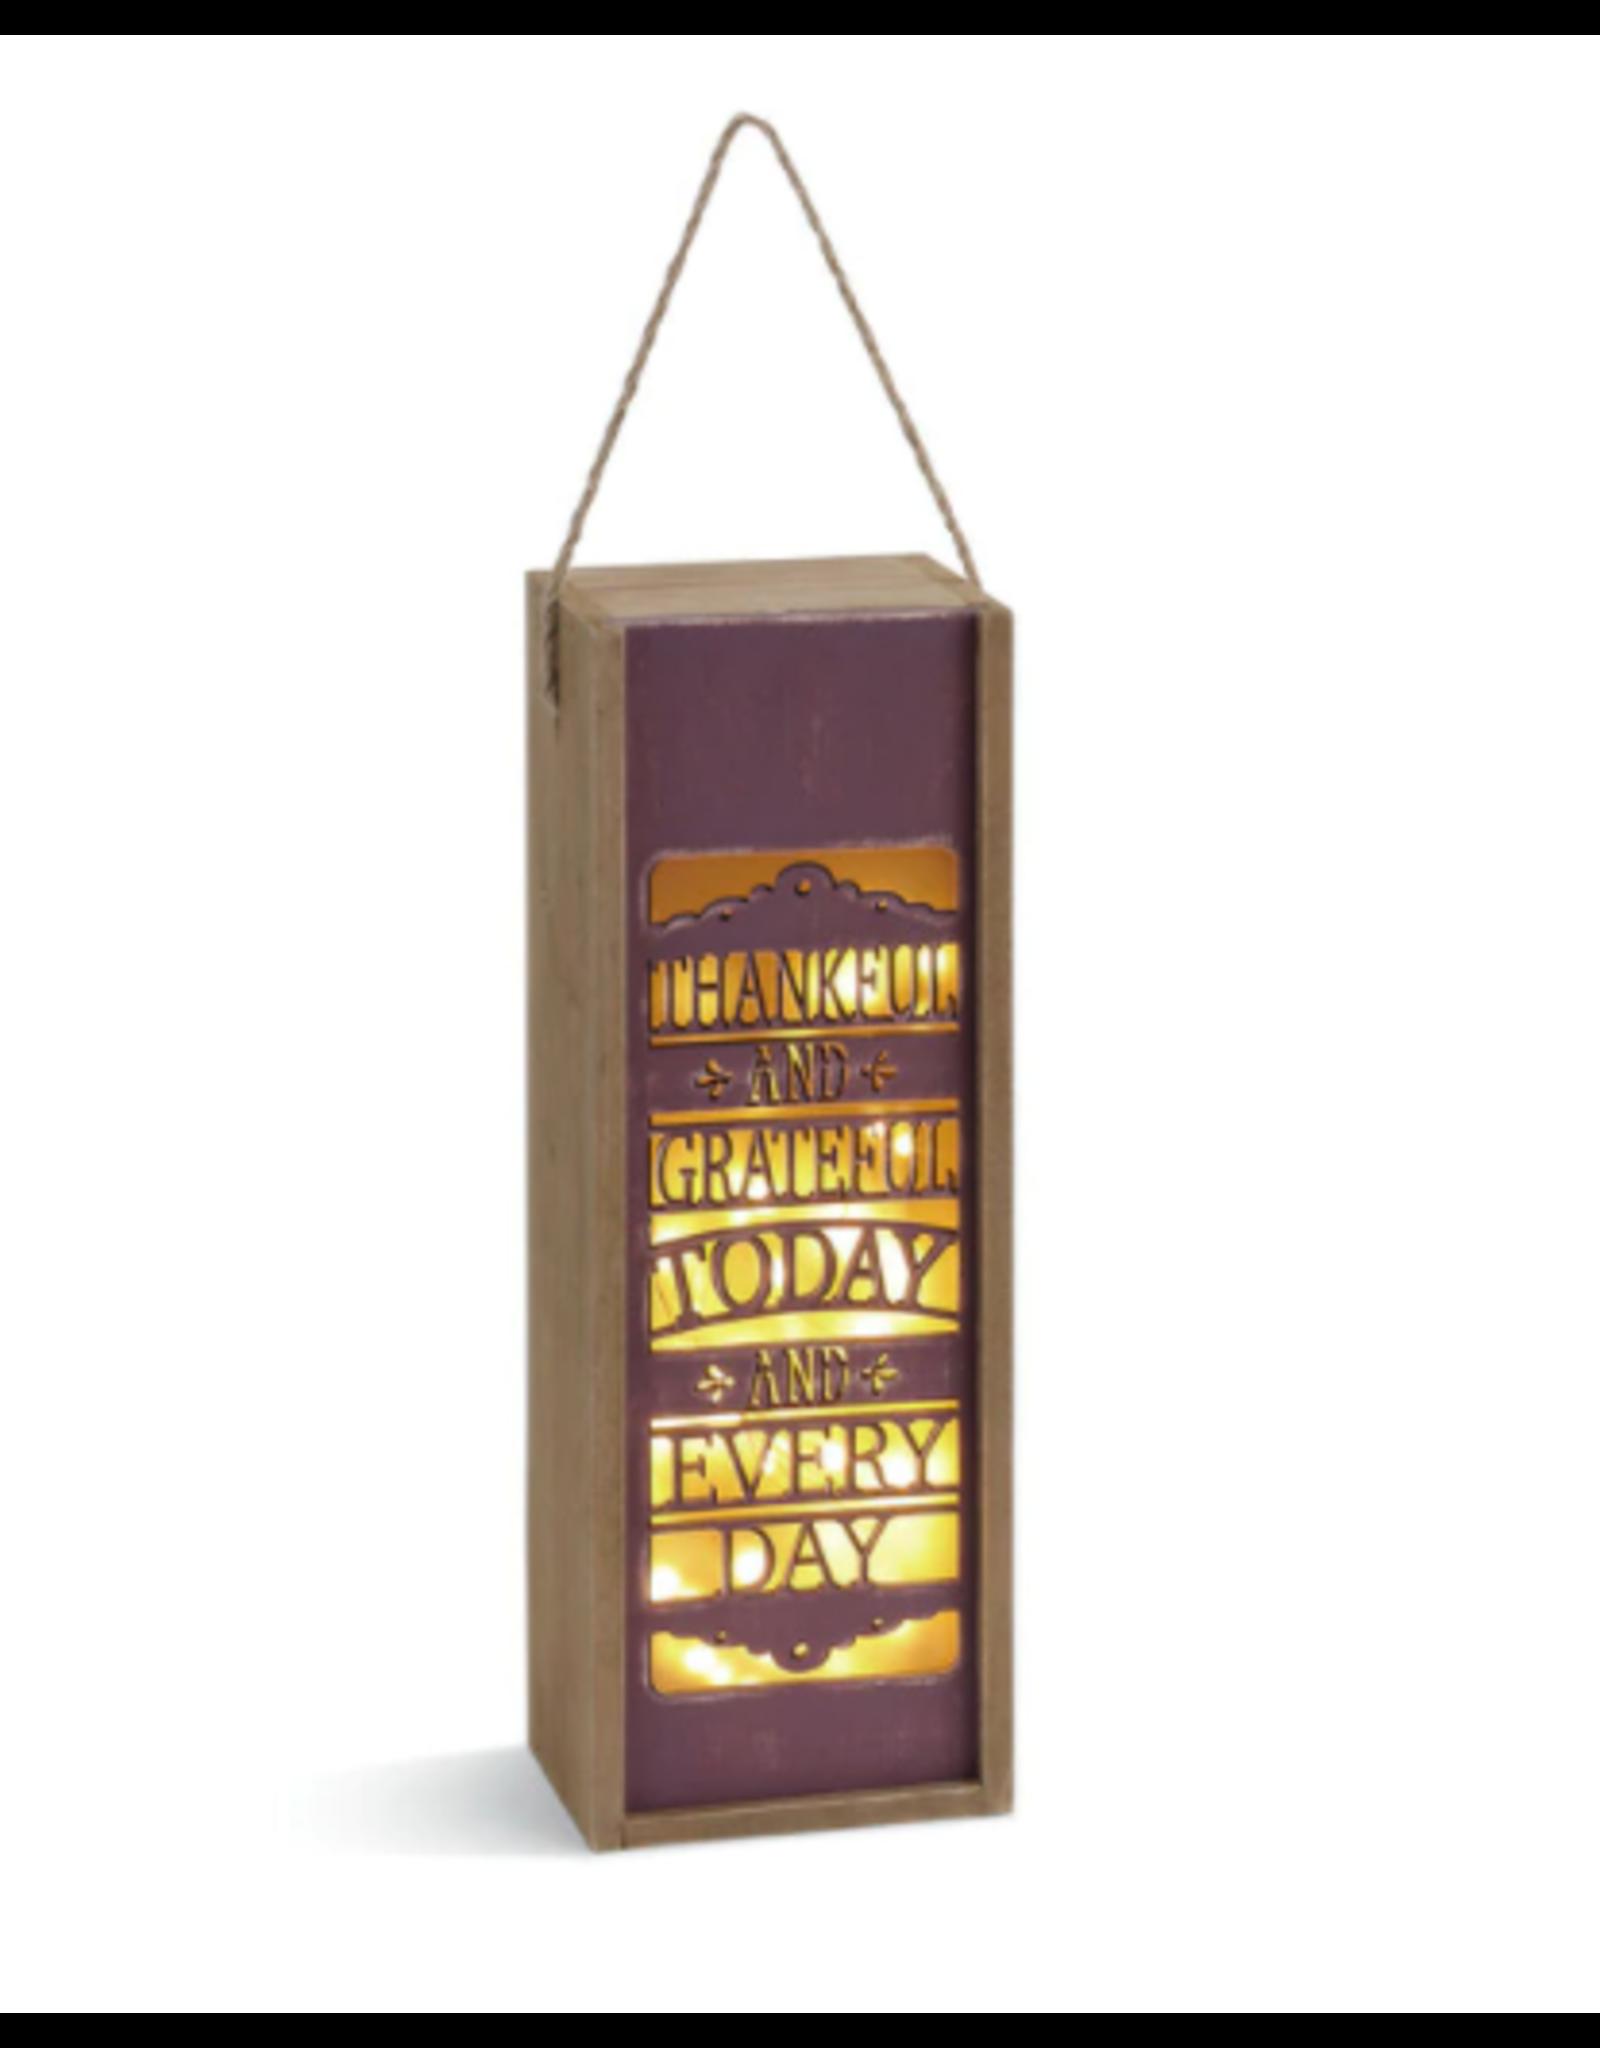 DEMDACO Thankful and Grateful Lantern and Wine Gift Box